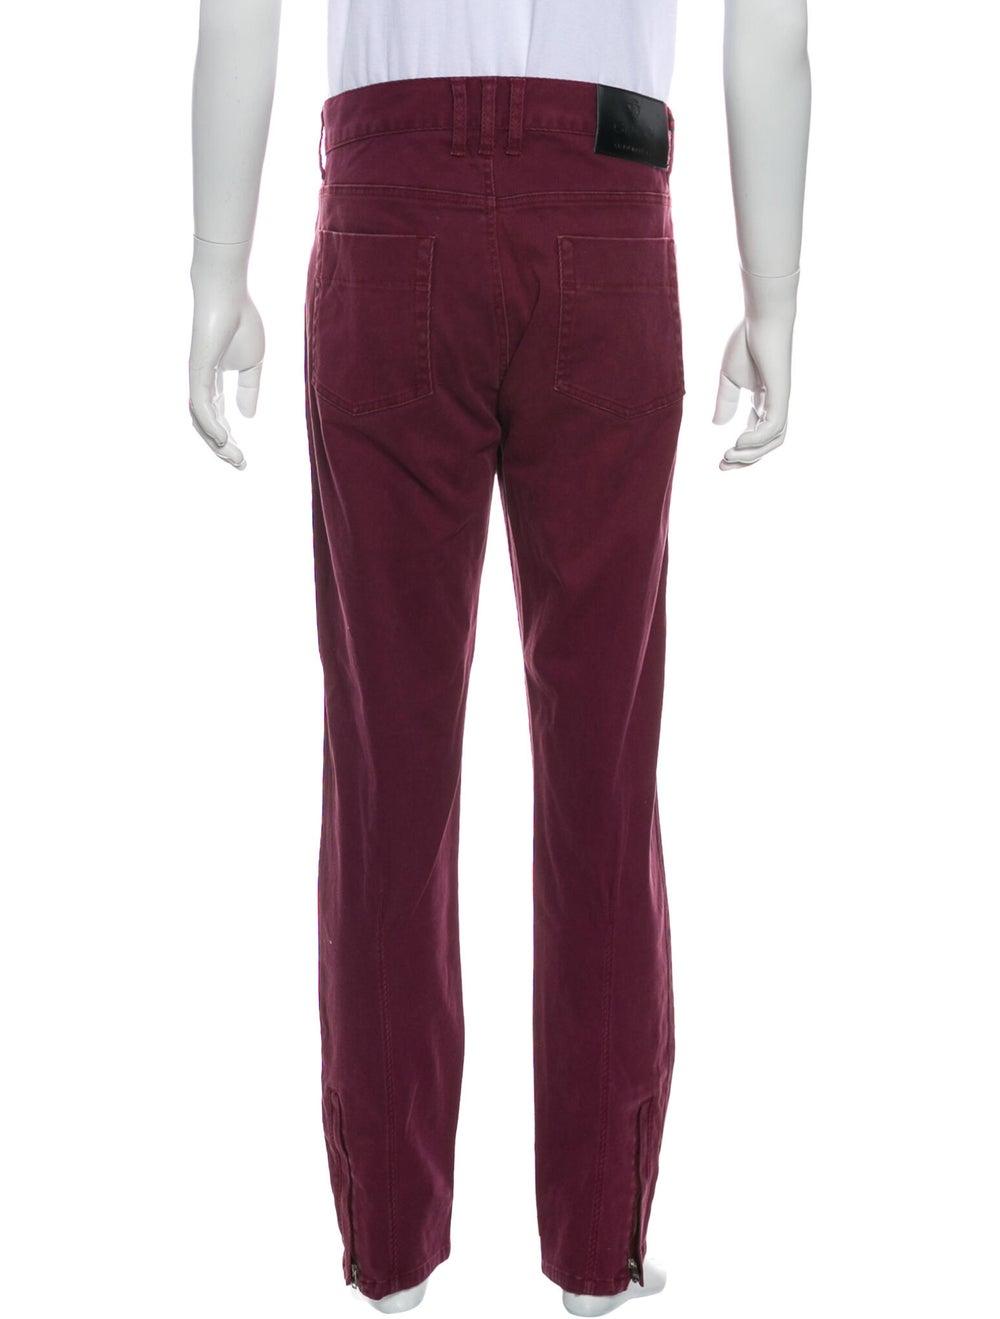 Gucci Corduroy Pants - image 3